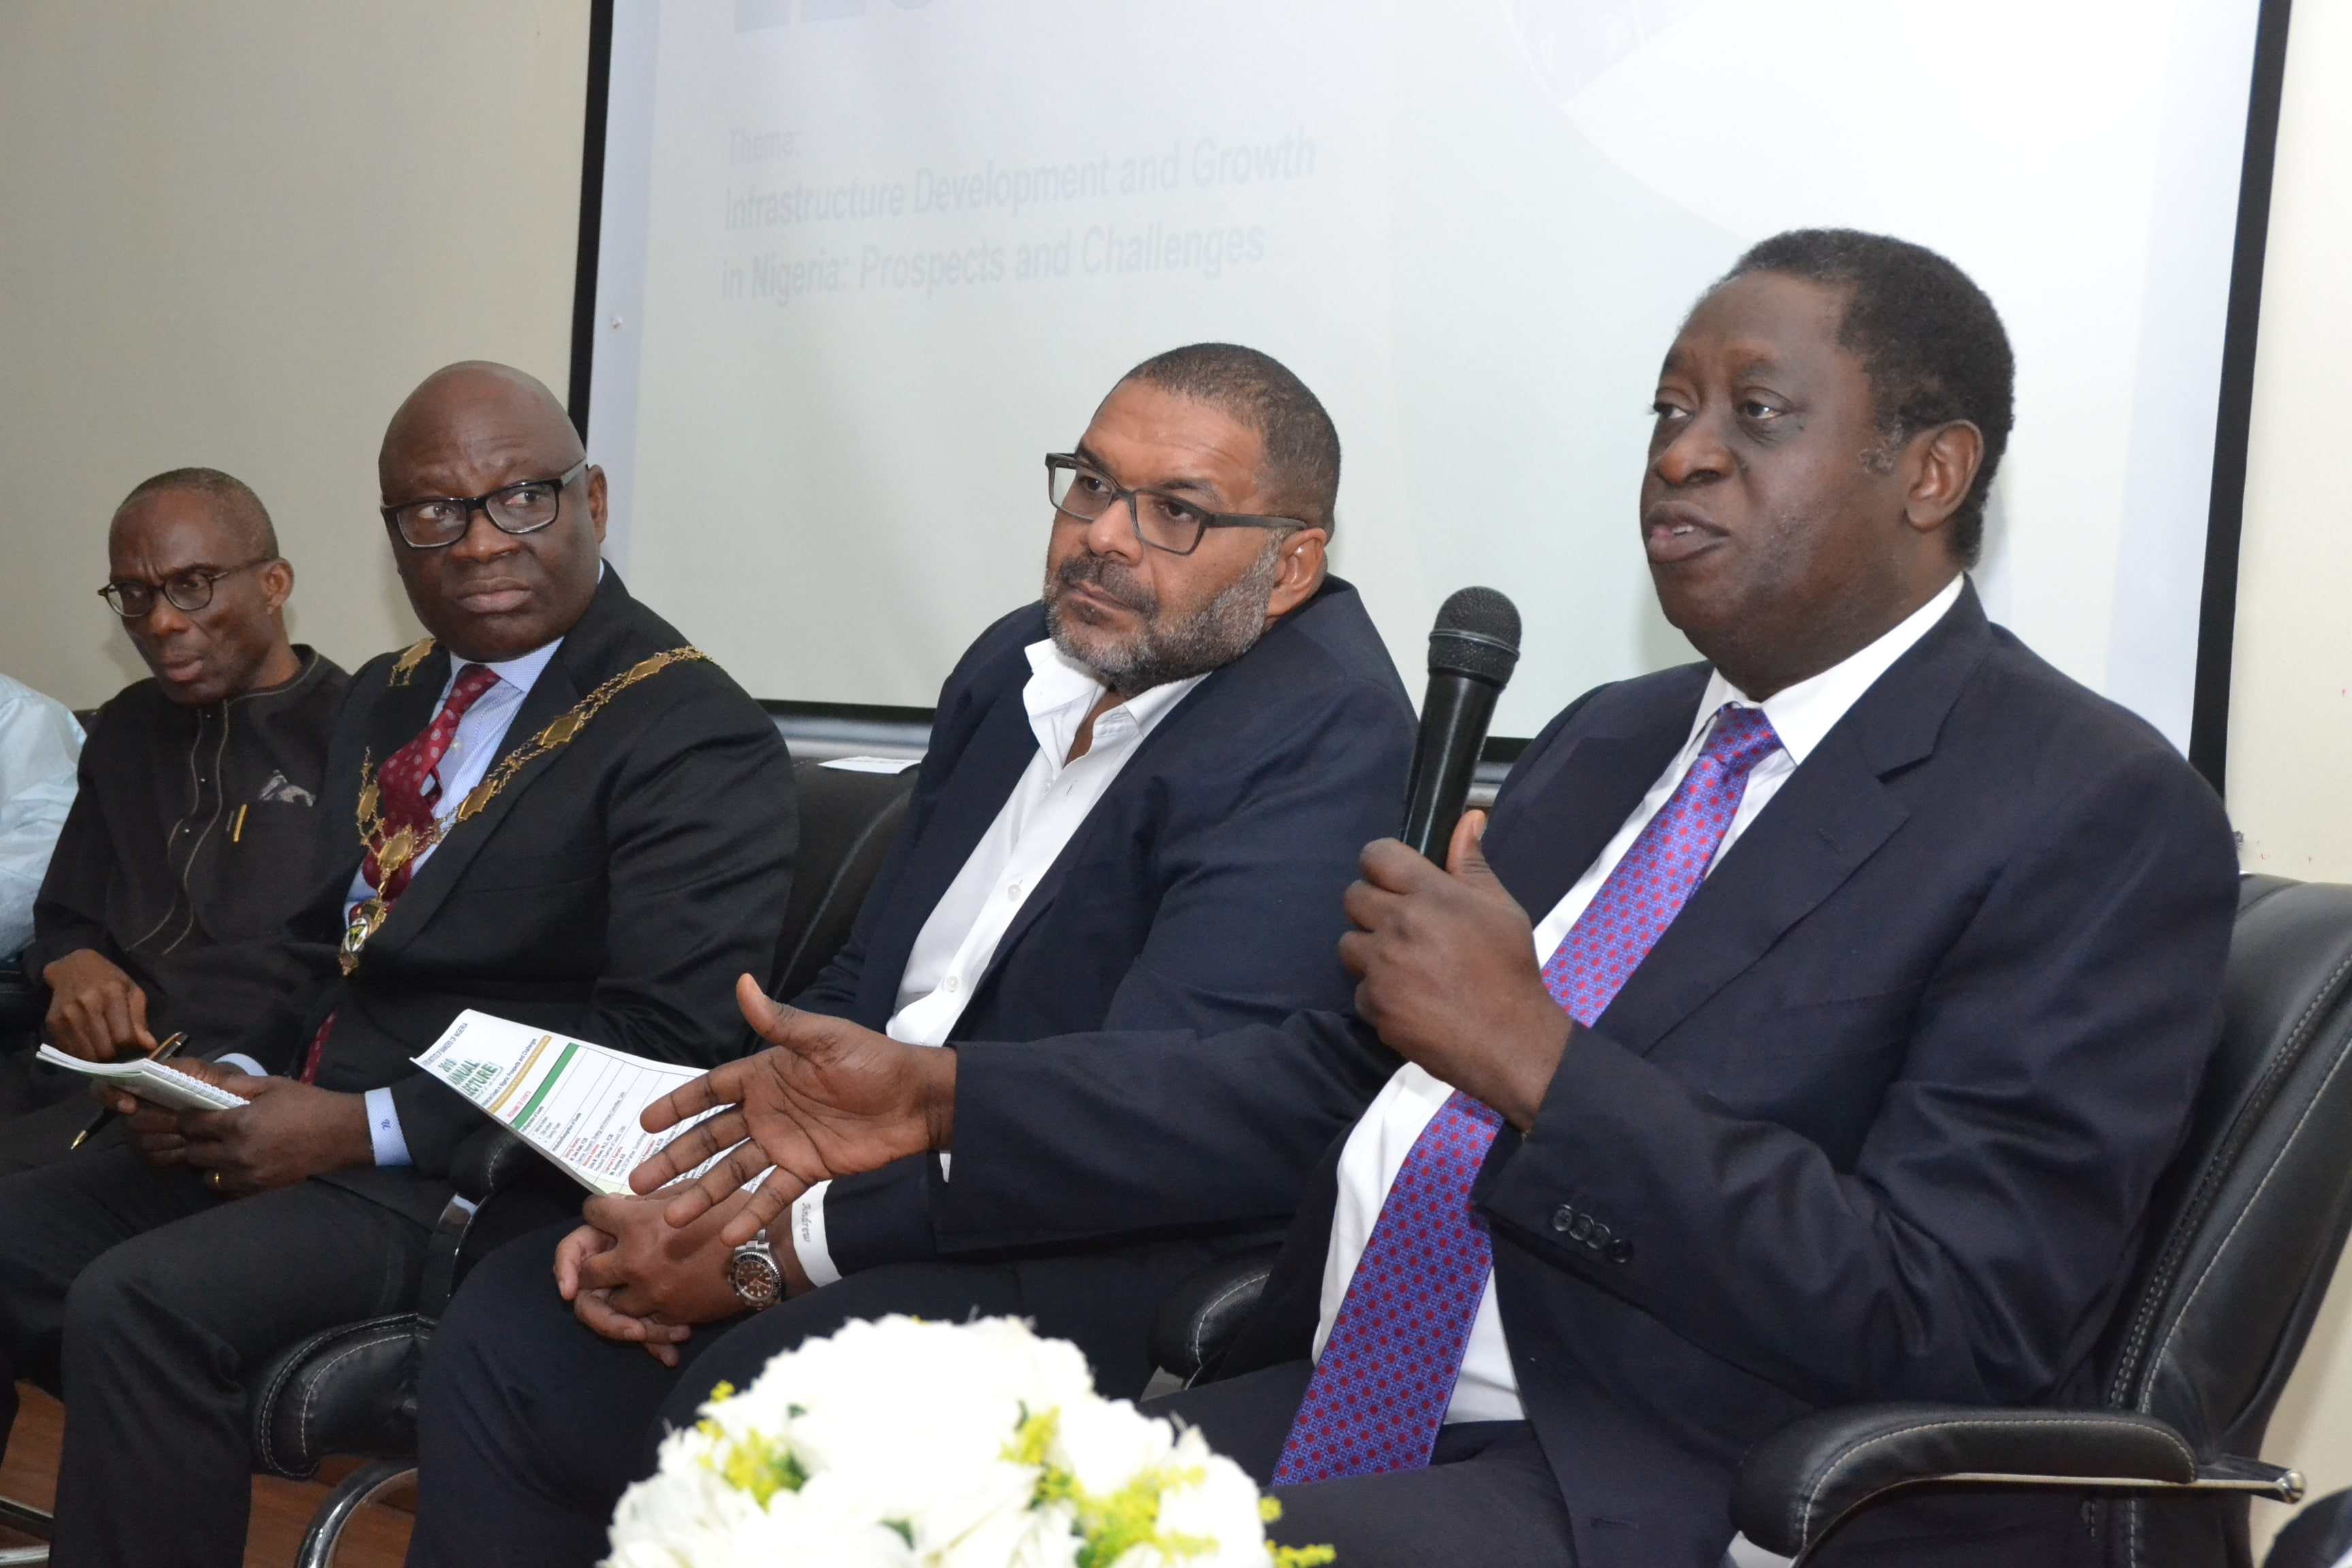 2019 Annual Lecture